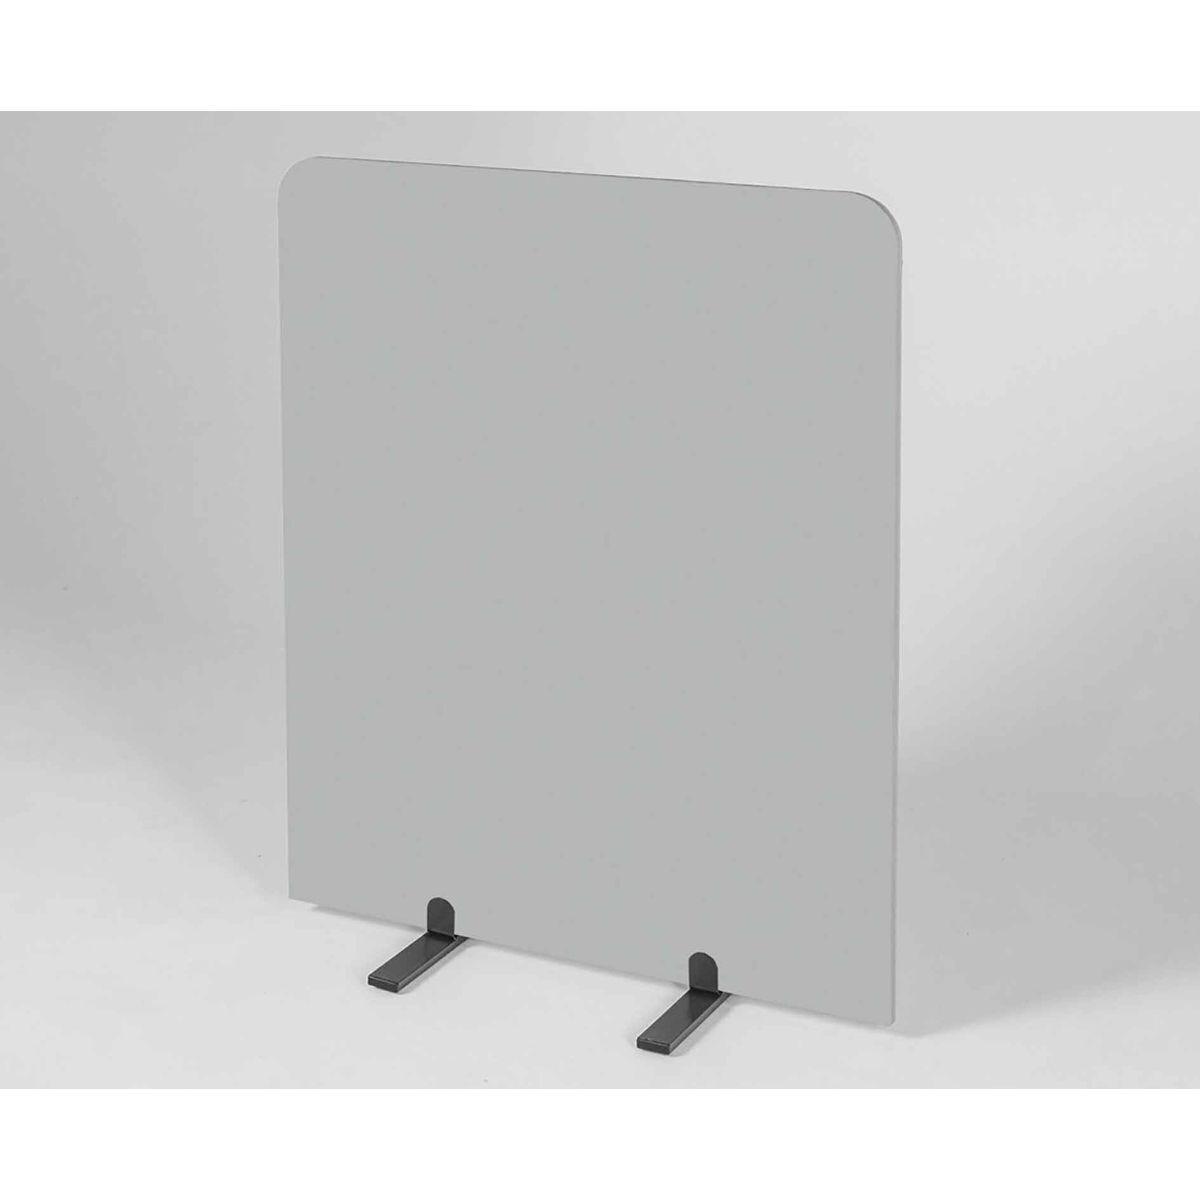 Metroplan BusyScreen Curve Screen 1450 x 1200mm Light Grey